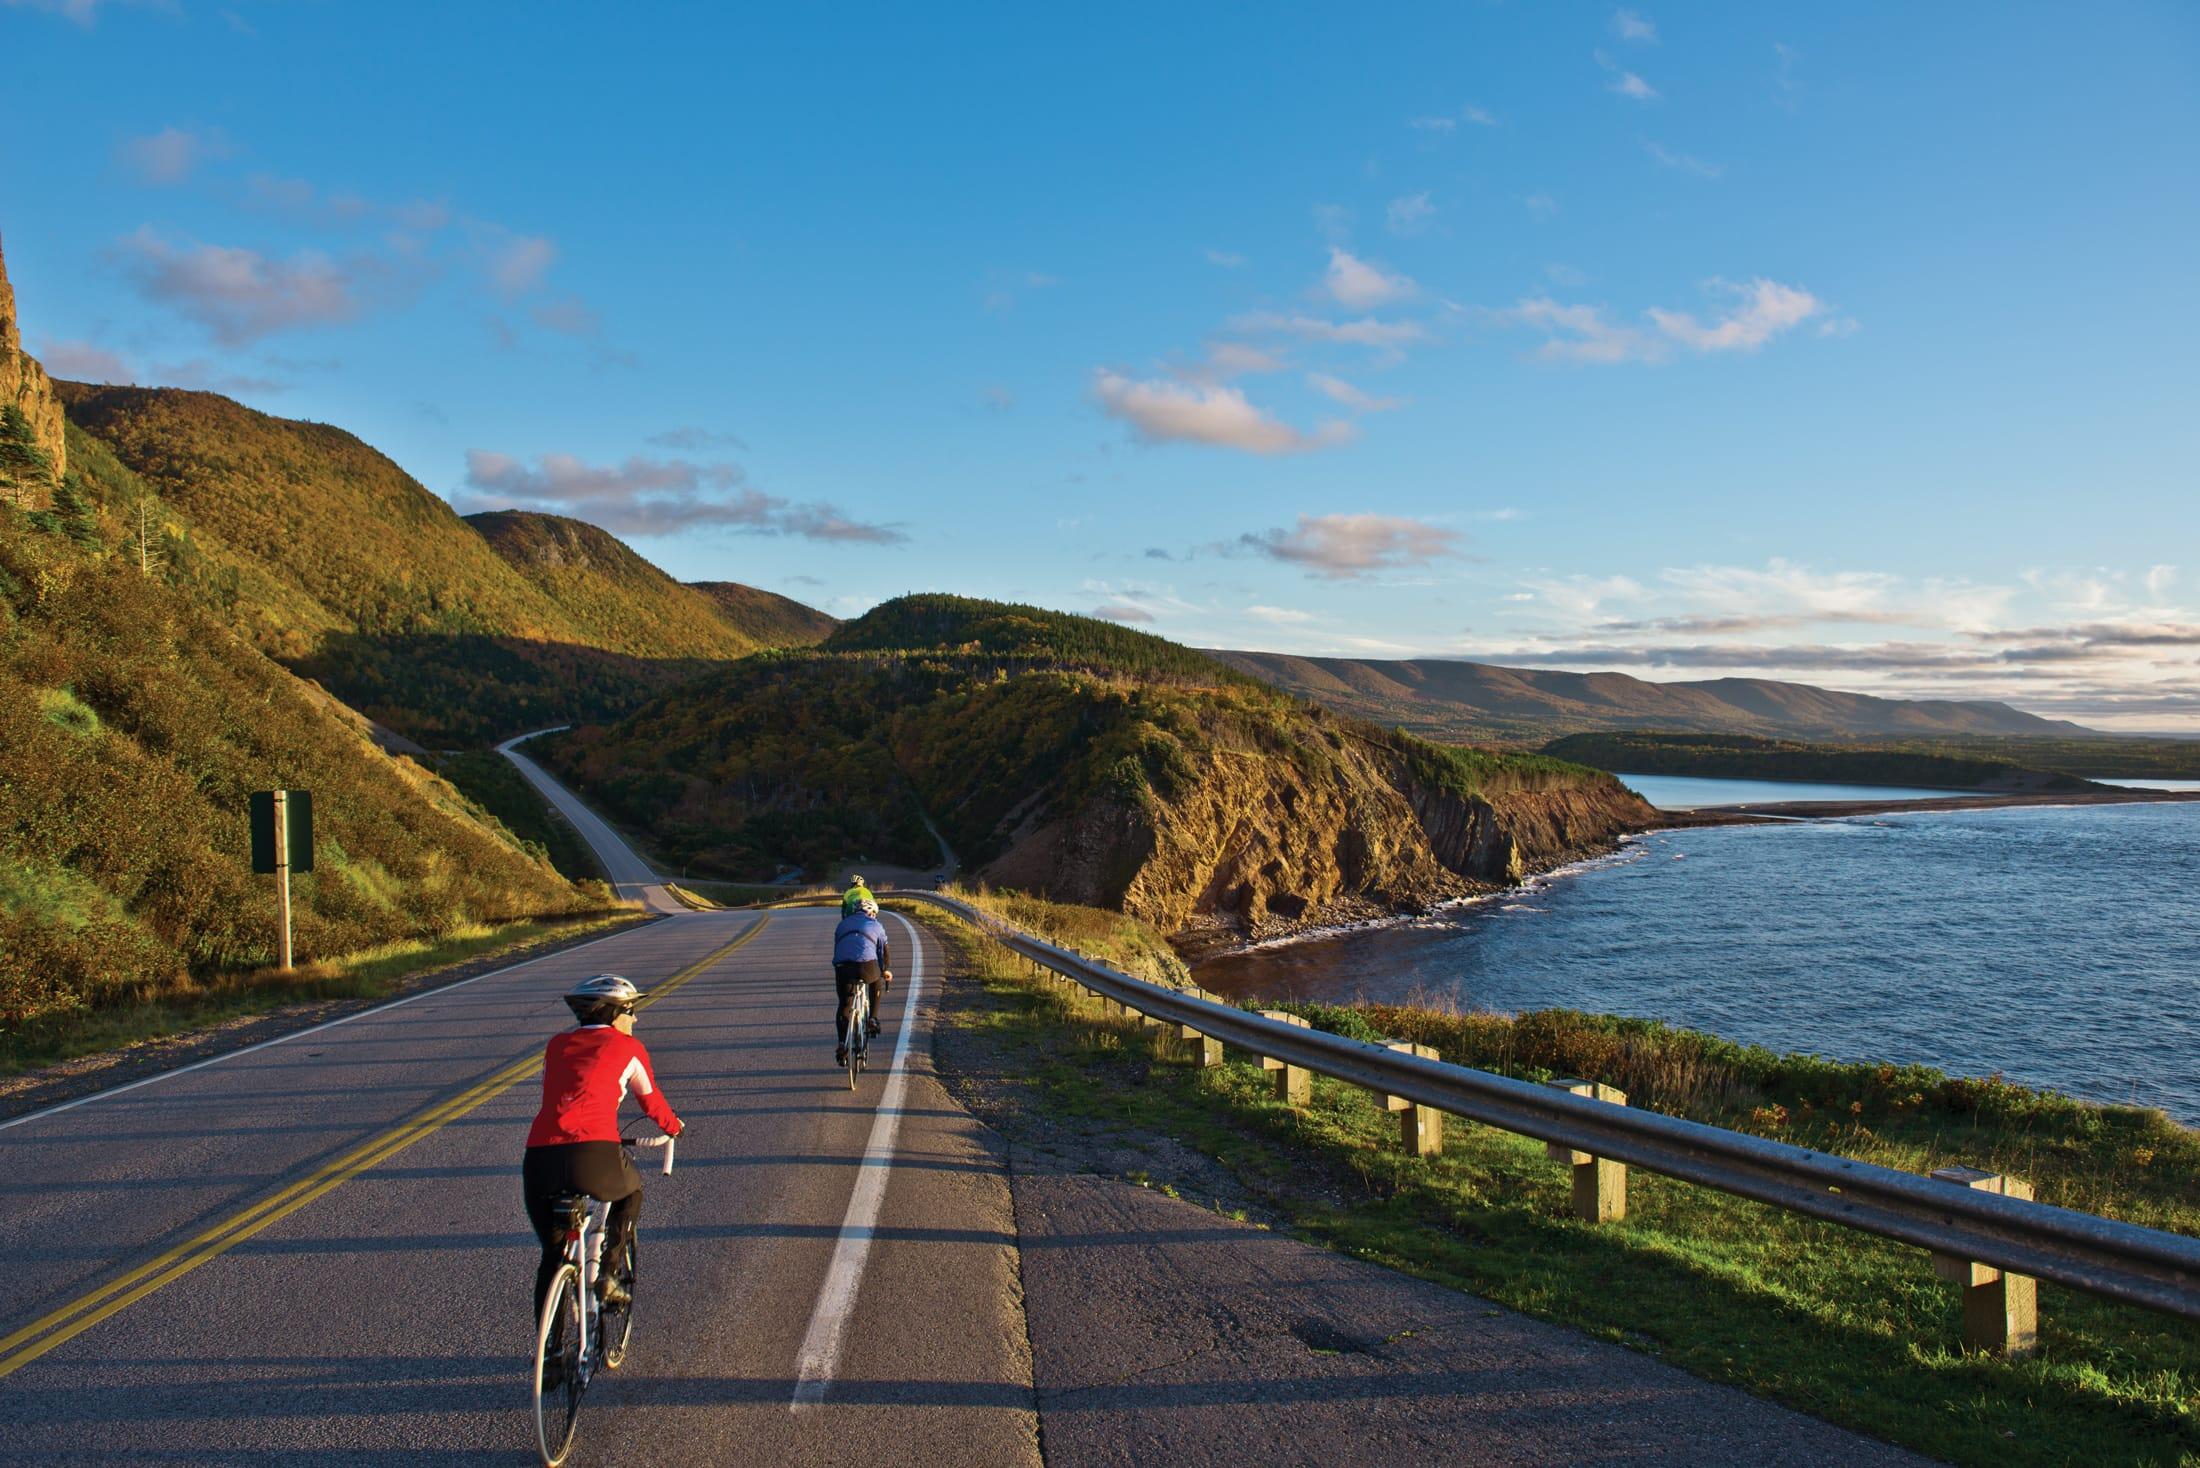 Bikers pedal down the highway overlooking the ocean